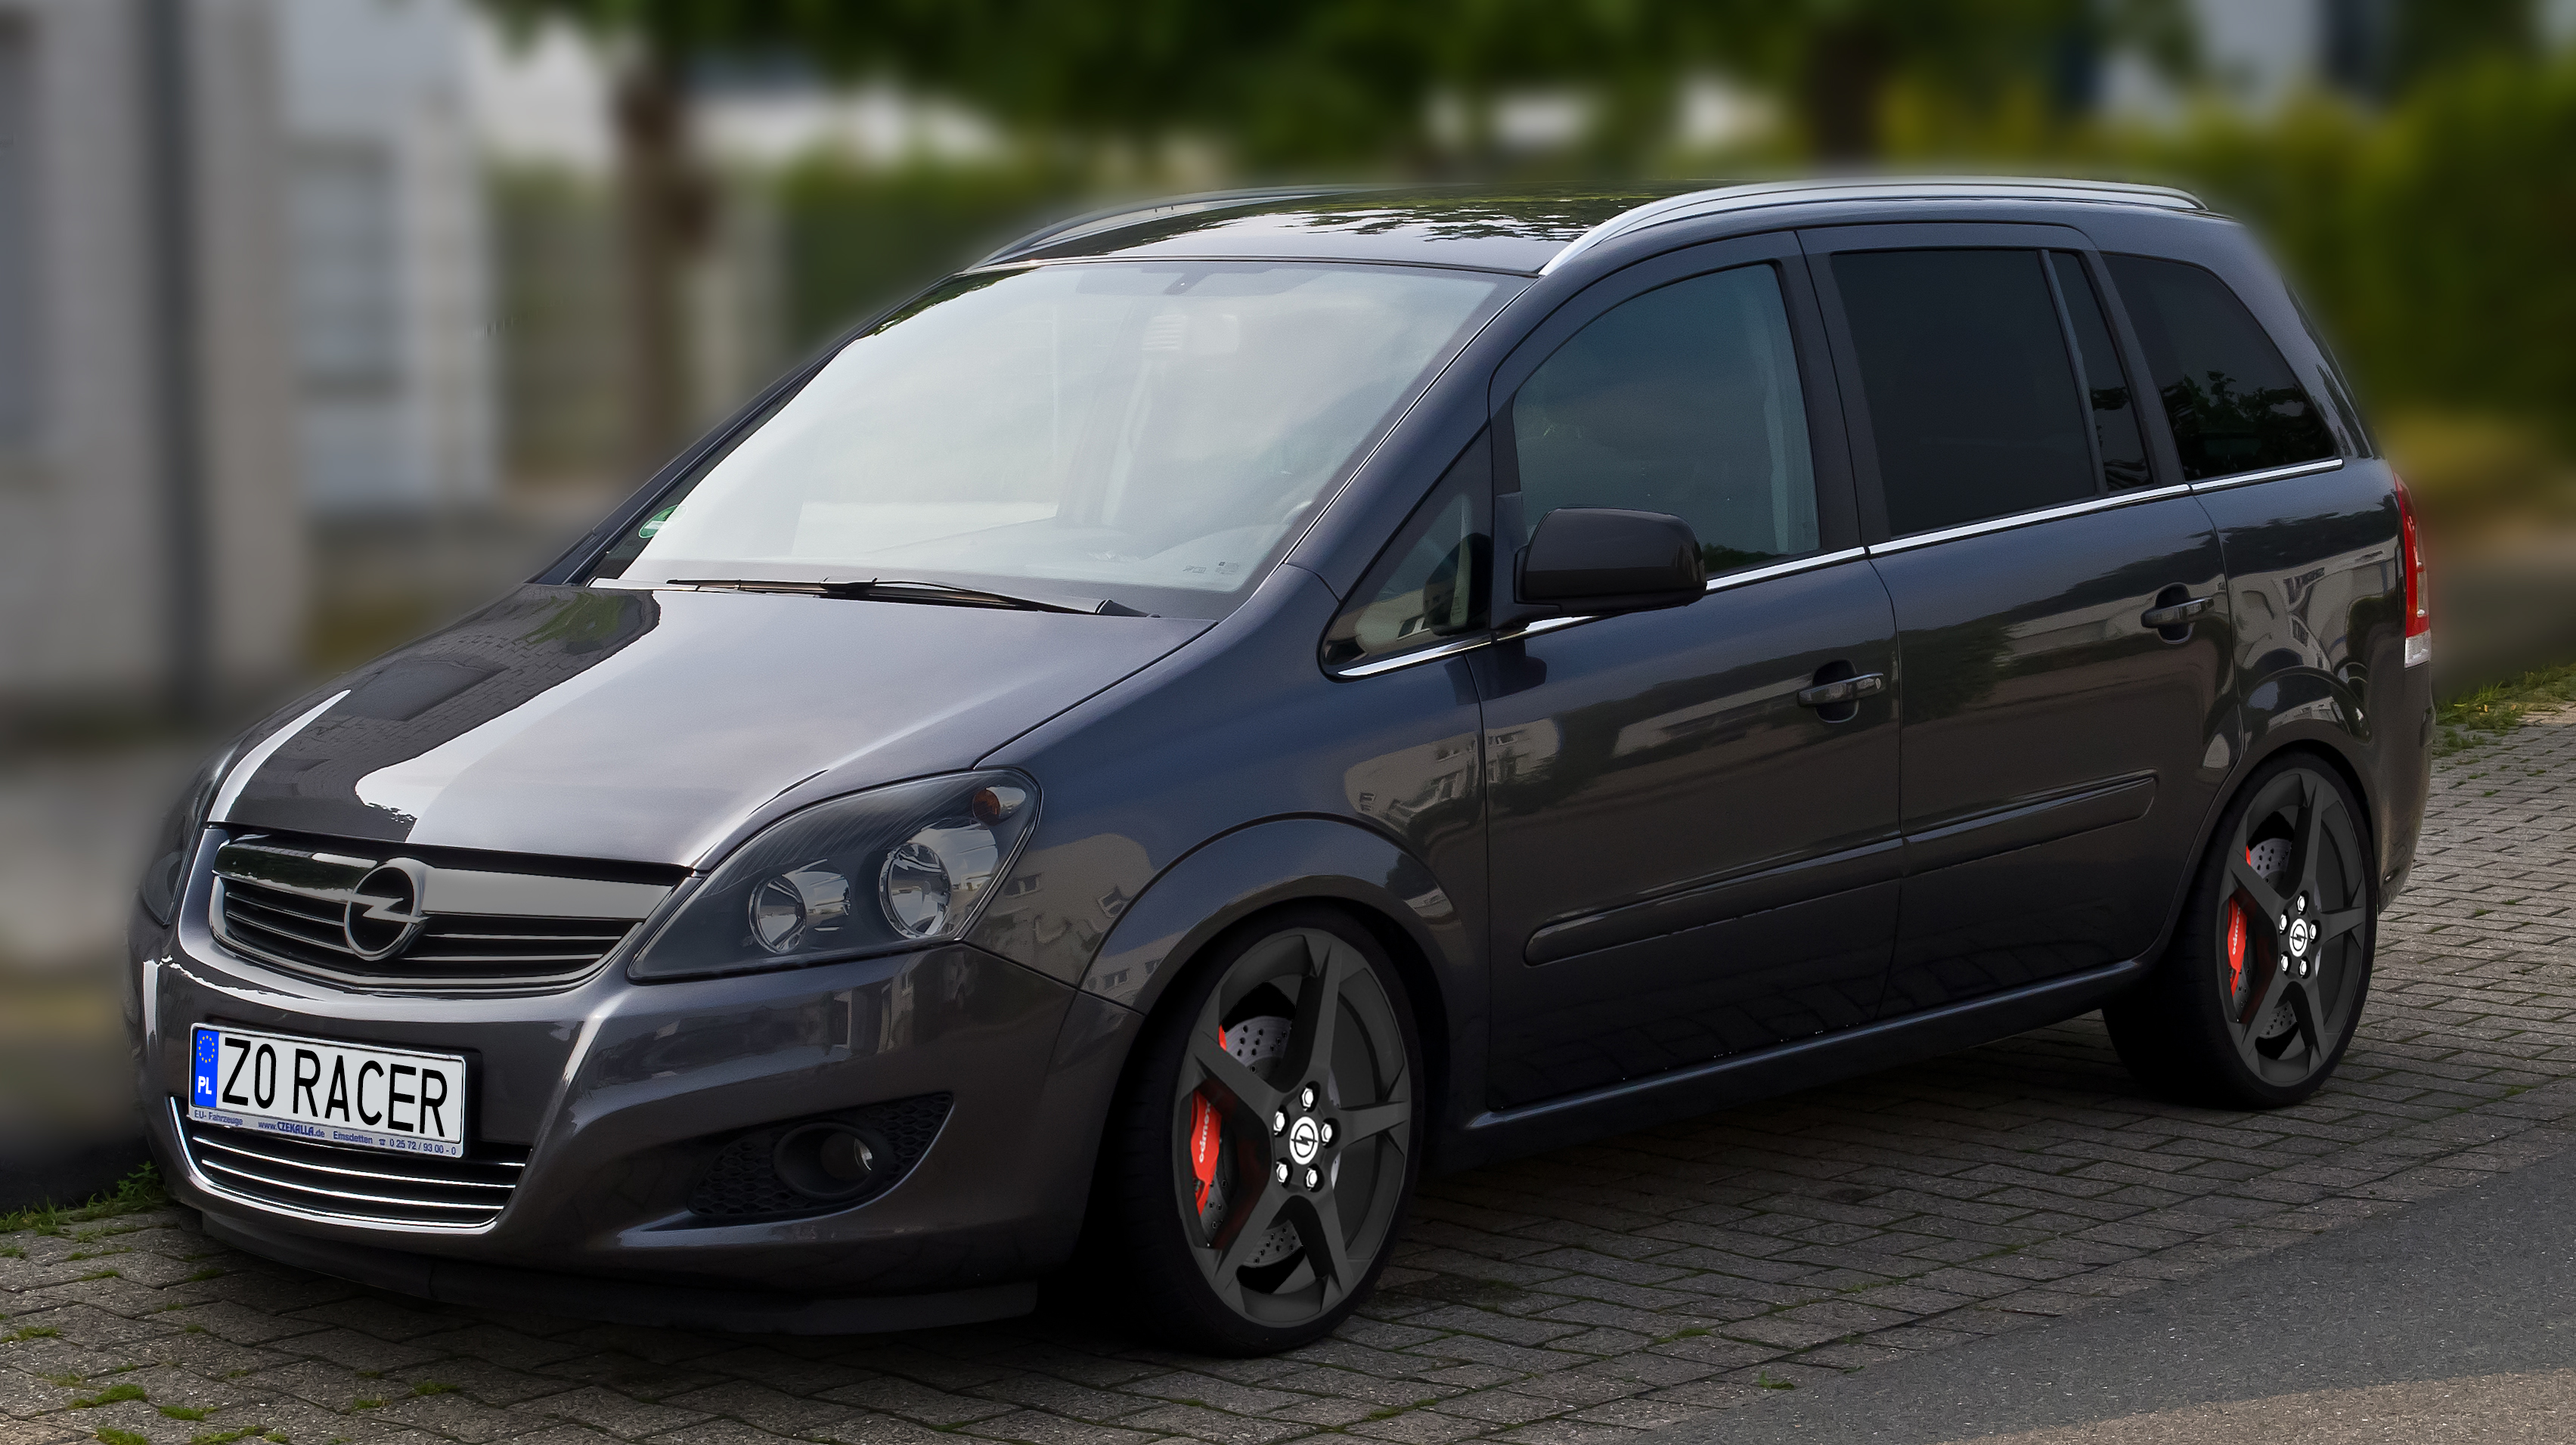 Audi a6 klub polska tuning jakie to auto propozycja zabawy - Opel Zafira Virtual Tuning